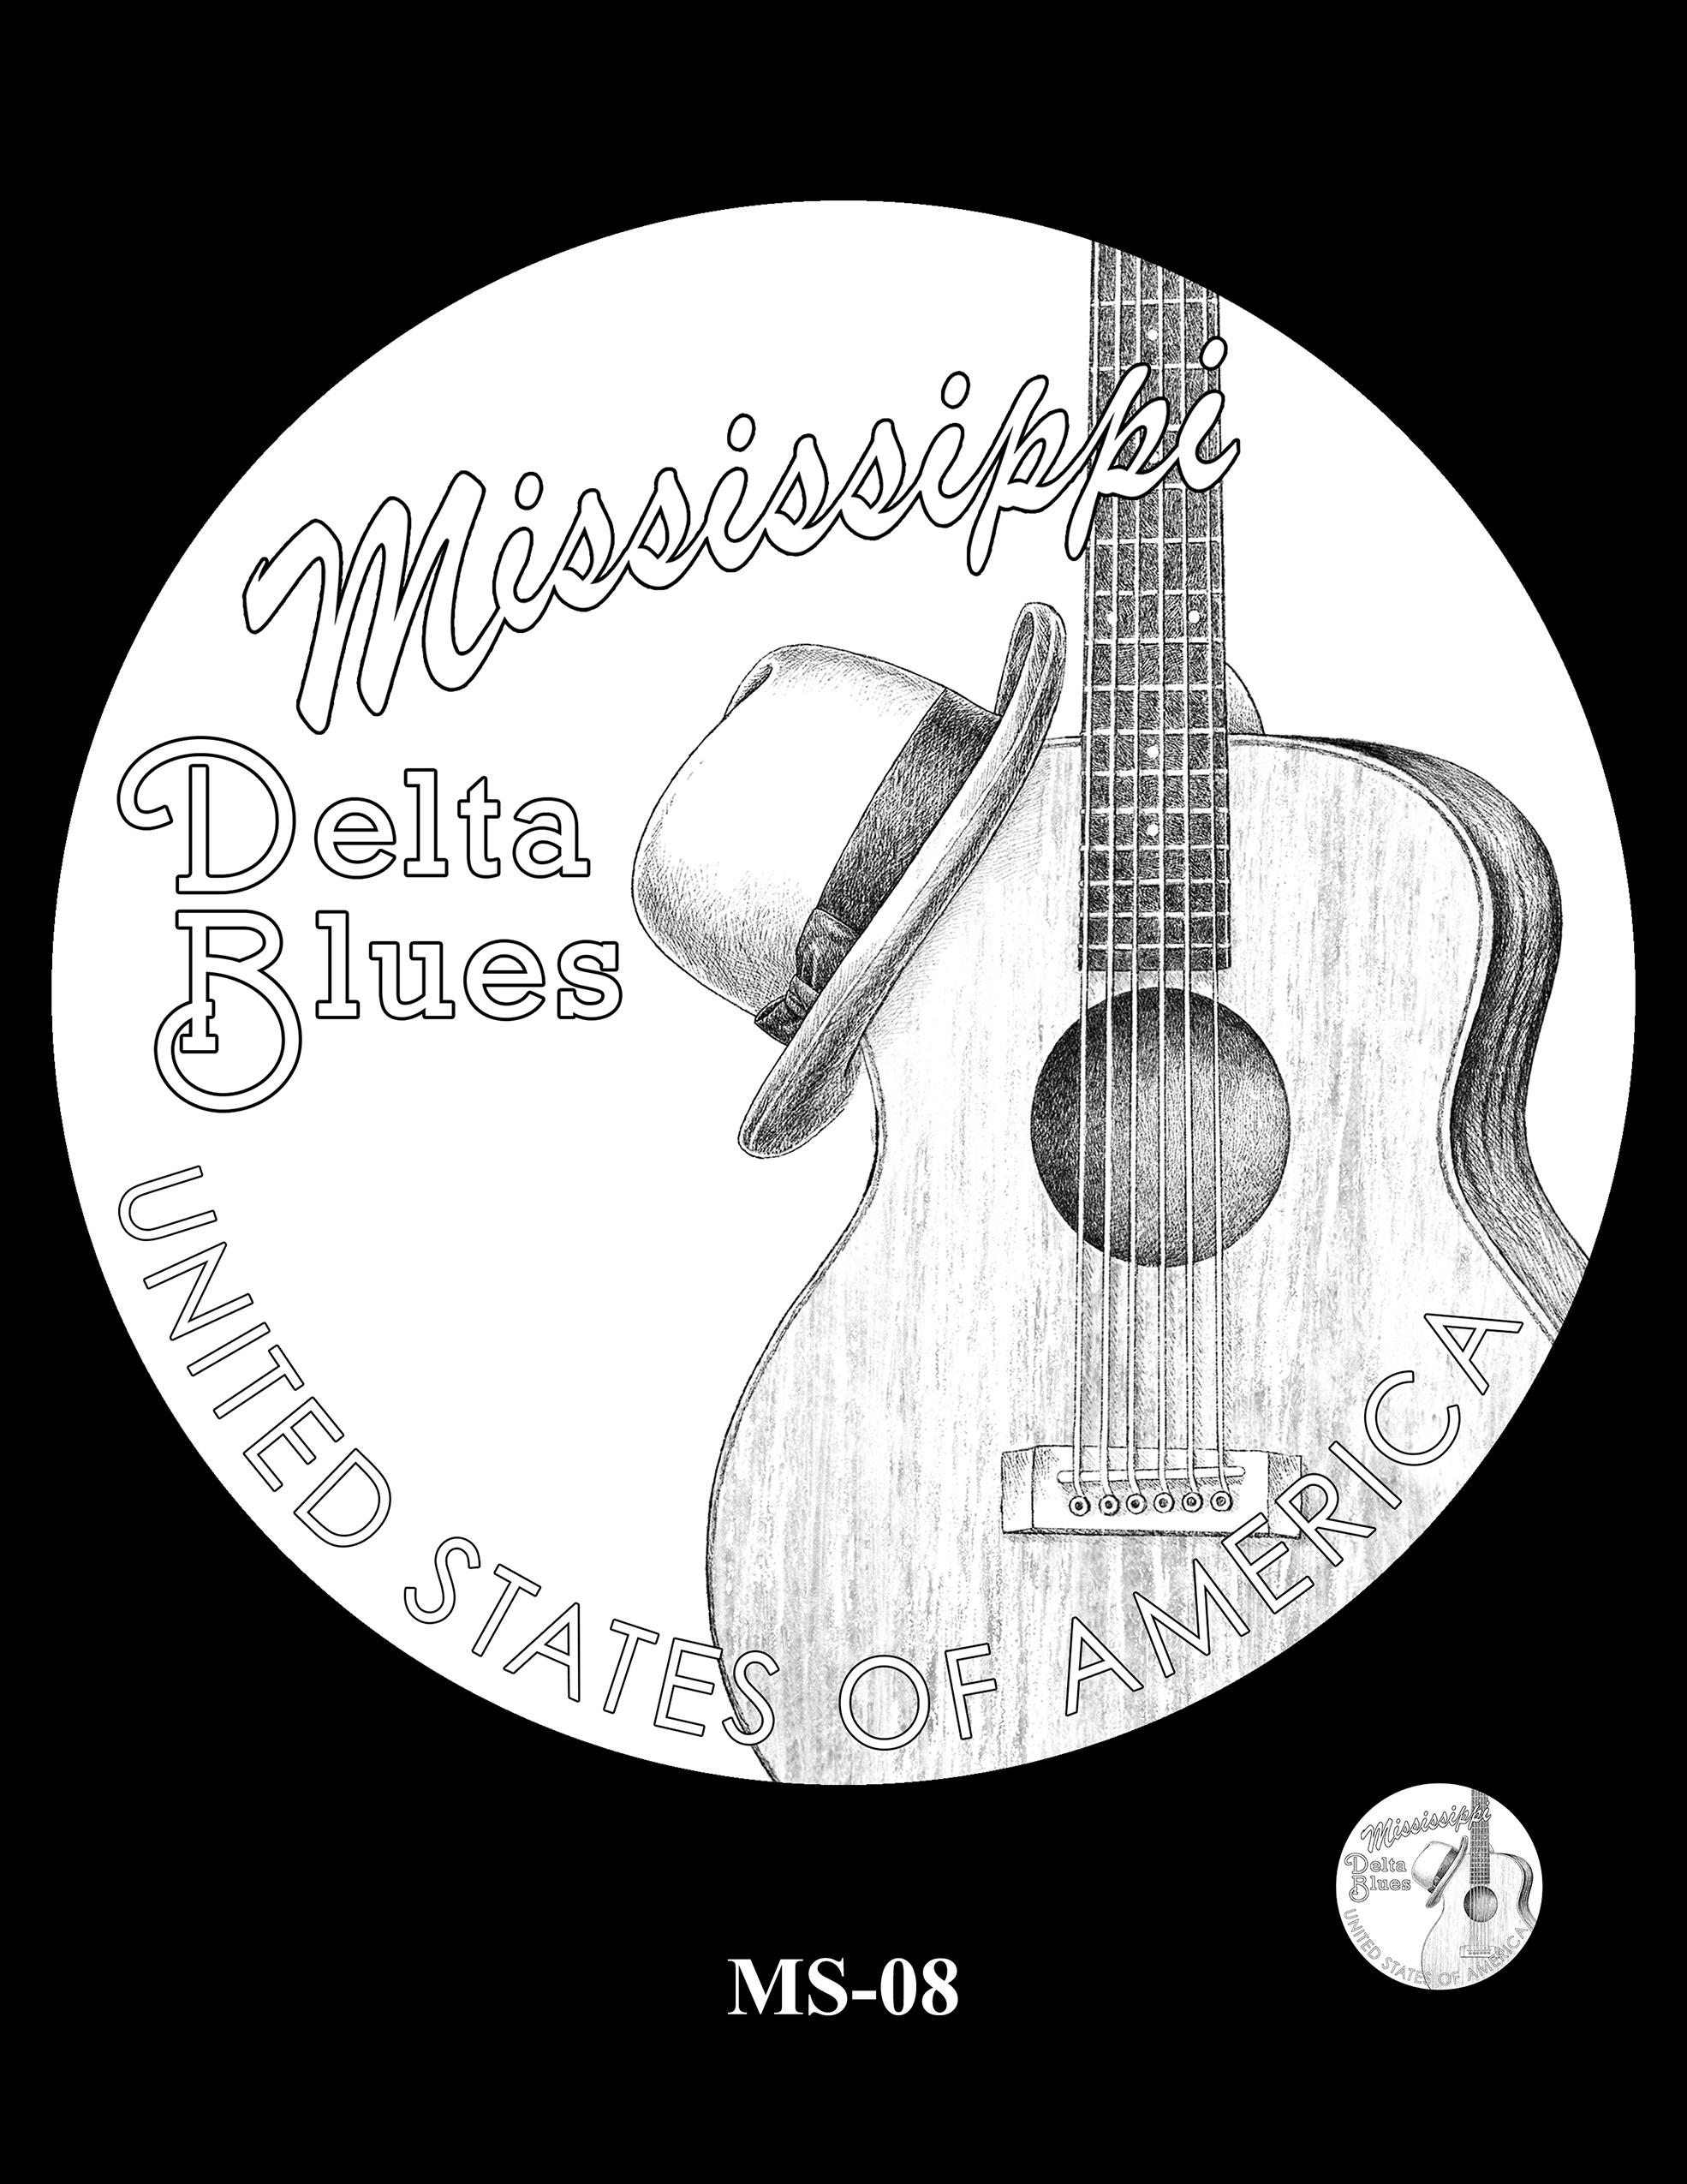 MS-08 -- 2023 American Innovation $1 Coin Program - Mississippi